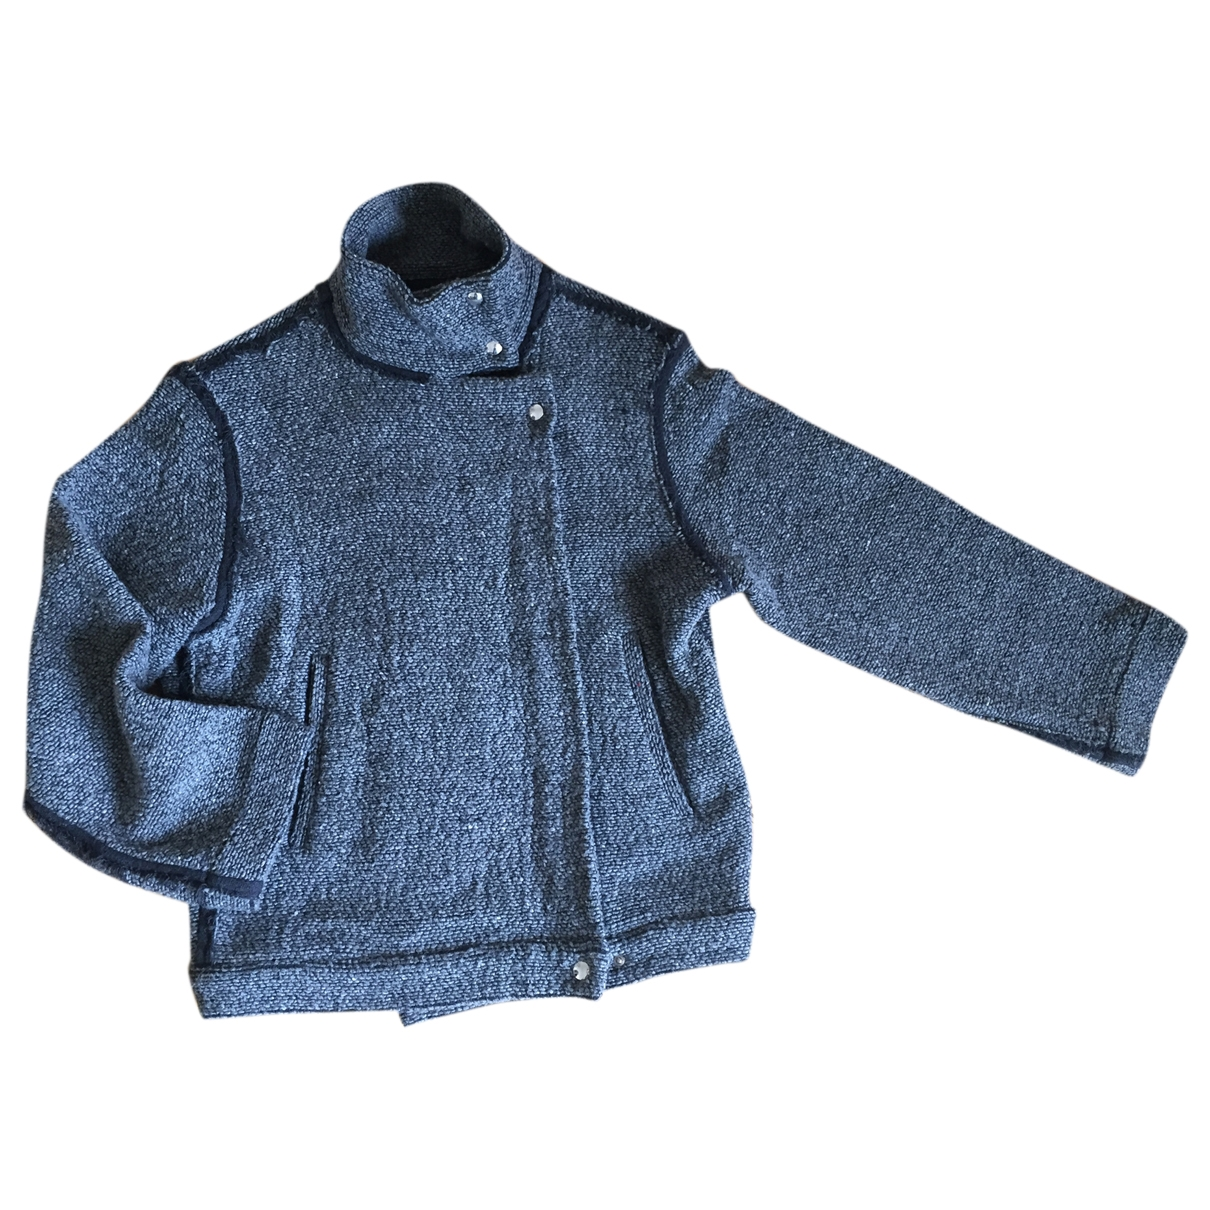 Iro \N Grey Cotton jacket for Women 1 US